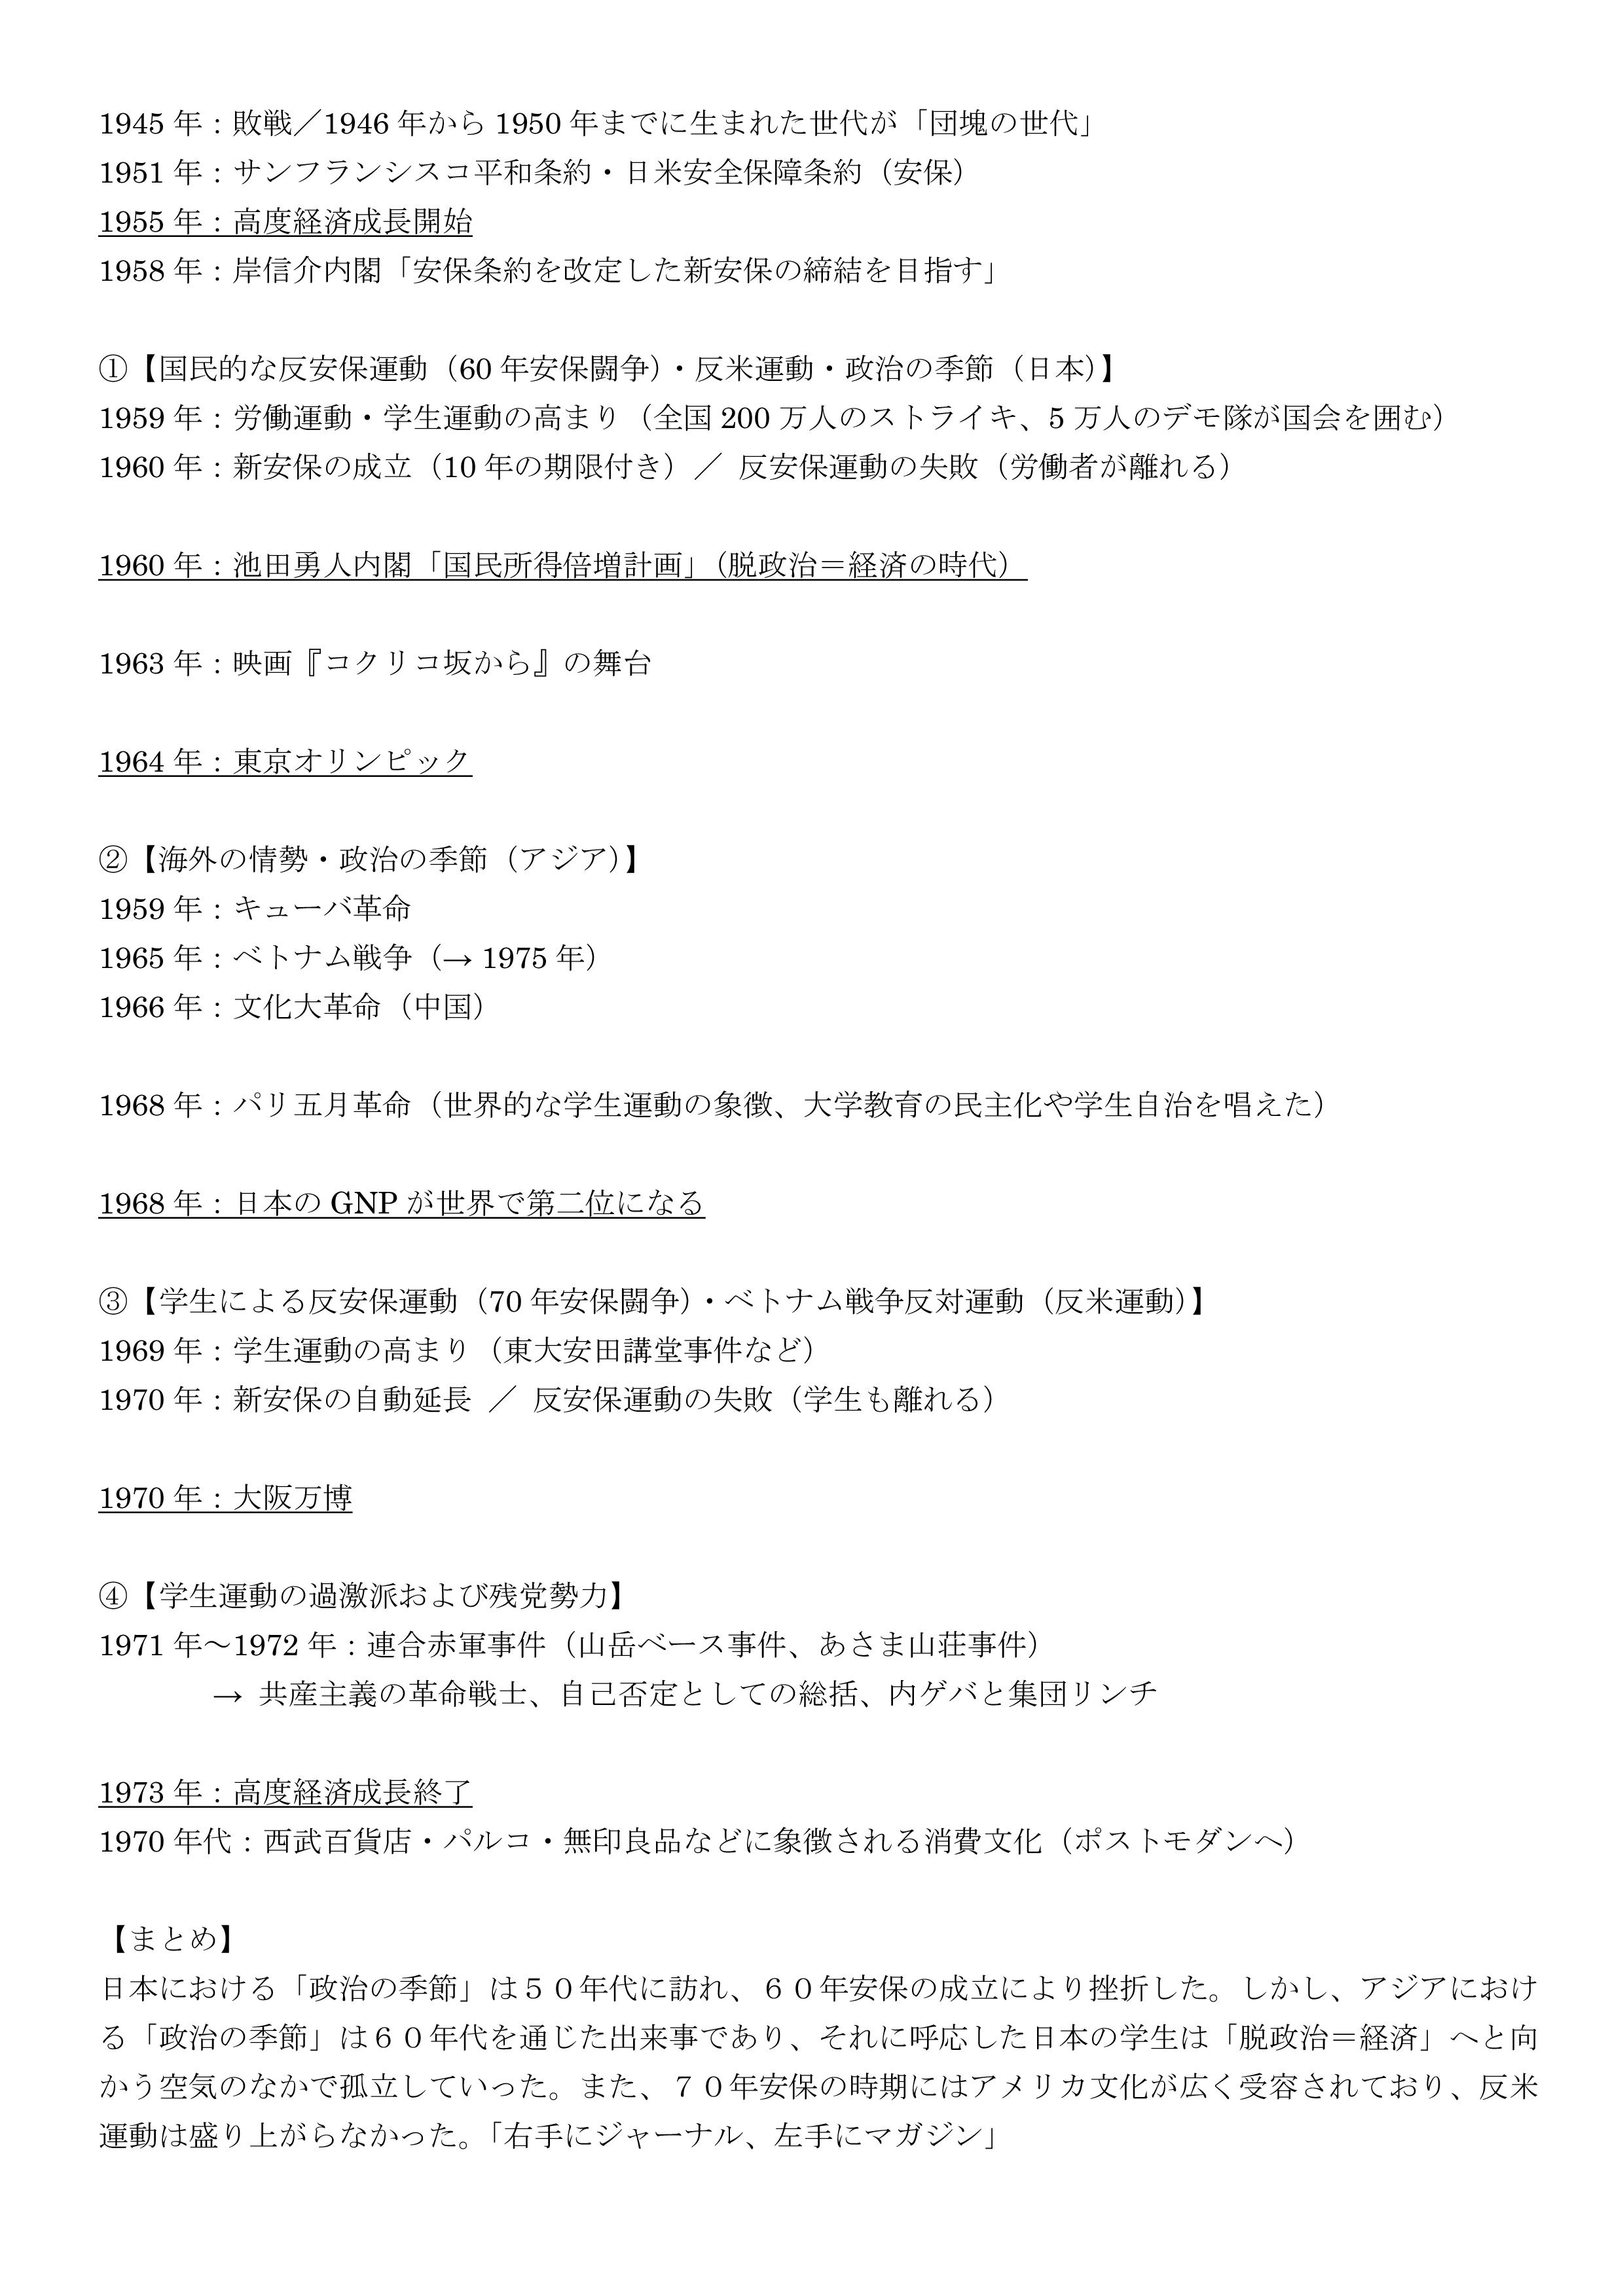 Microsoft Word - 日本の戦後